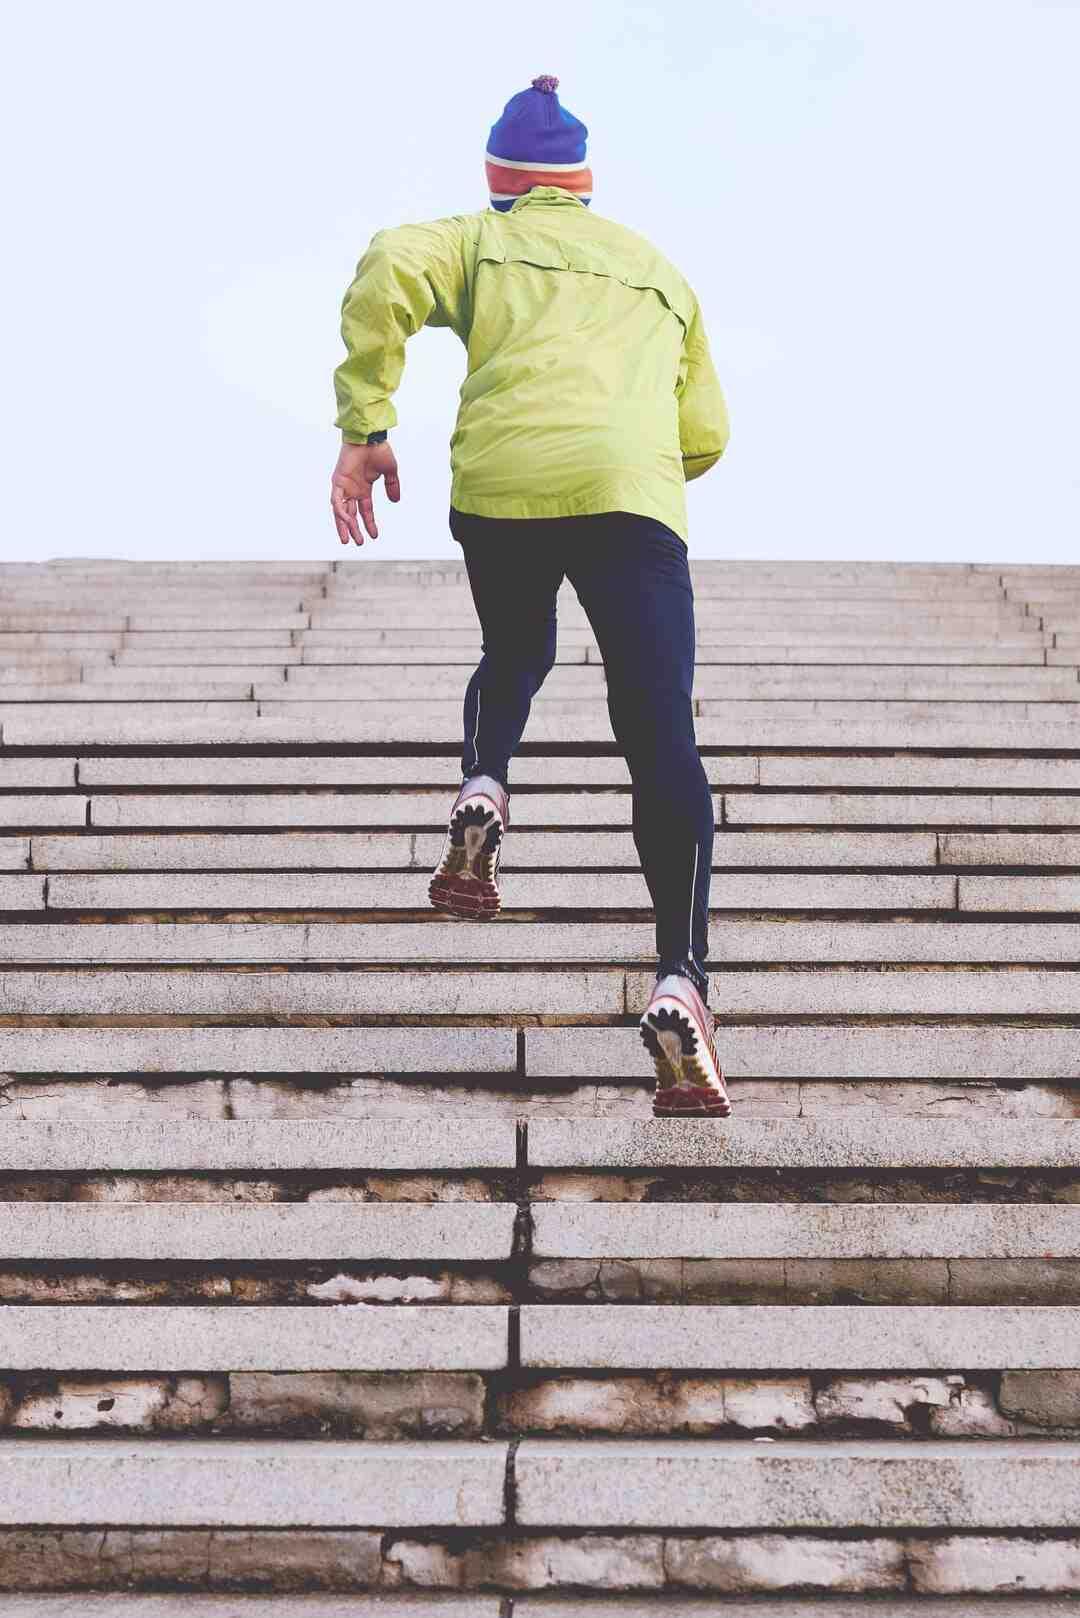 Quel exercice pour maigrir vite ?